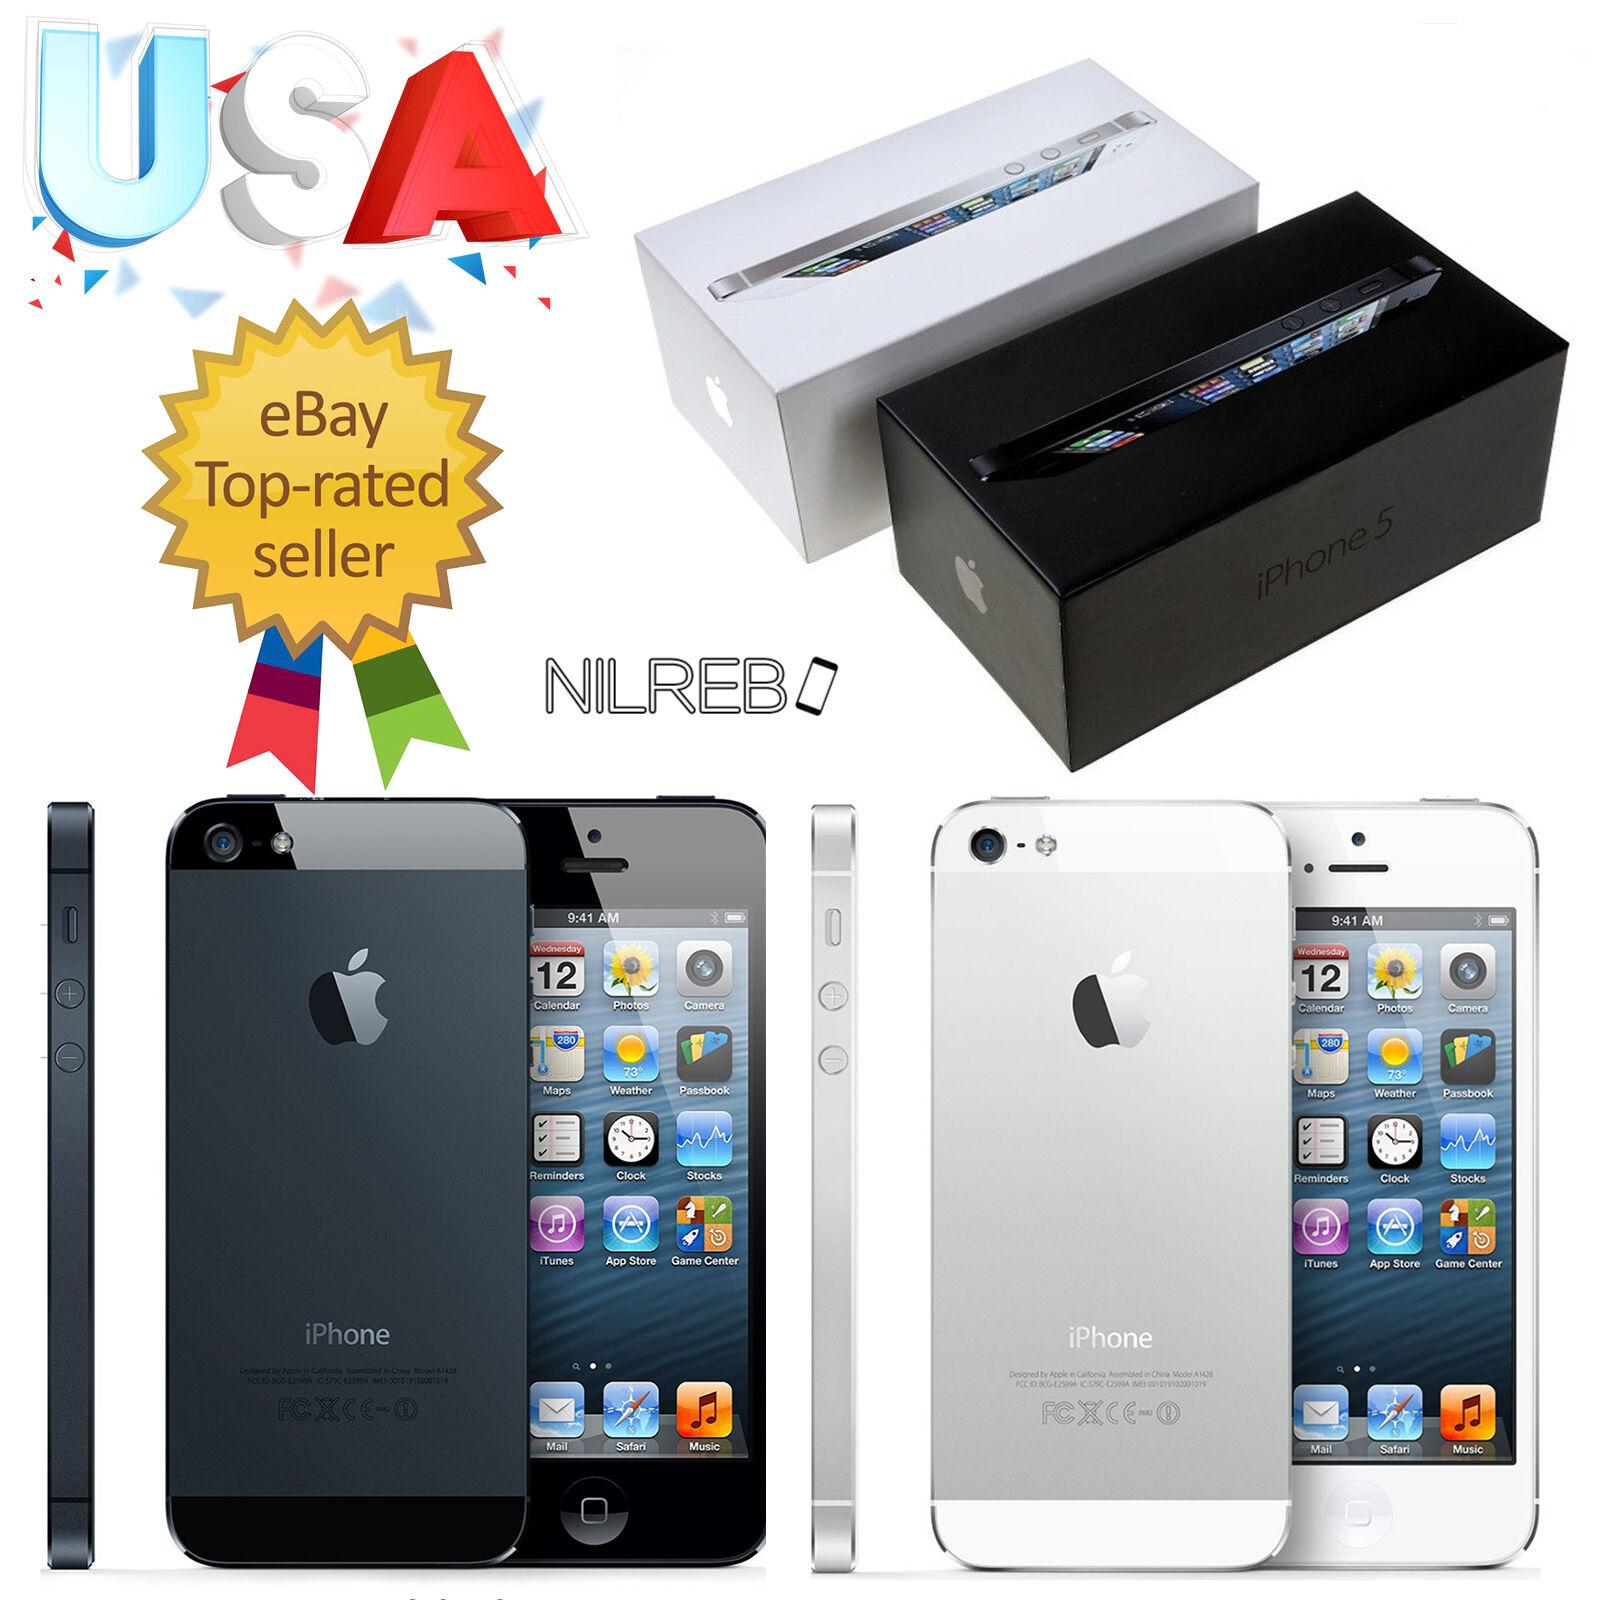 $156.78 - NEW FACTORY UNLOCKED APPLE IPHONE 5 16GB 32GB SMARTPHONE NEW BLACK WHITE CDMA